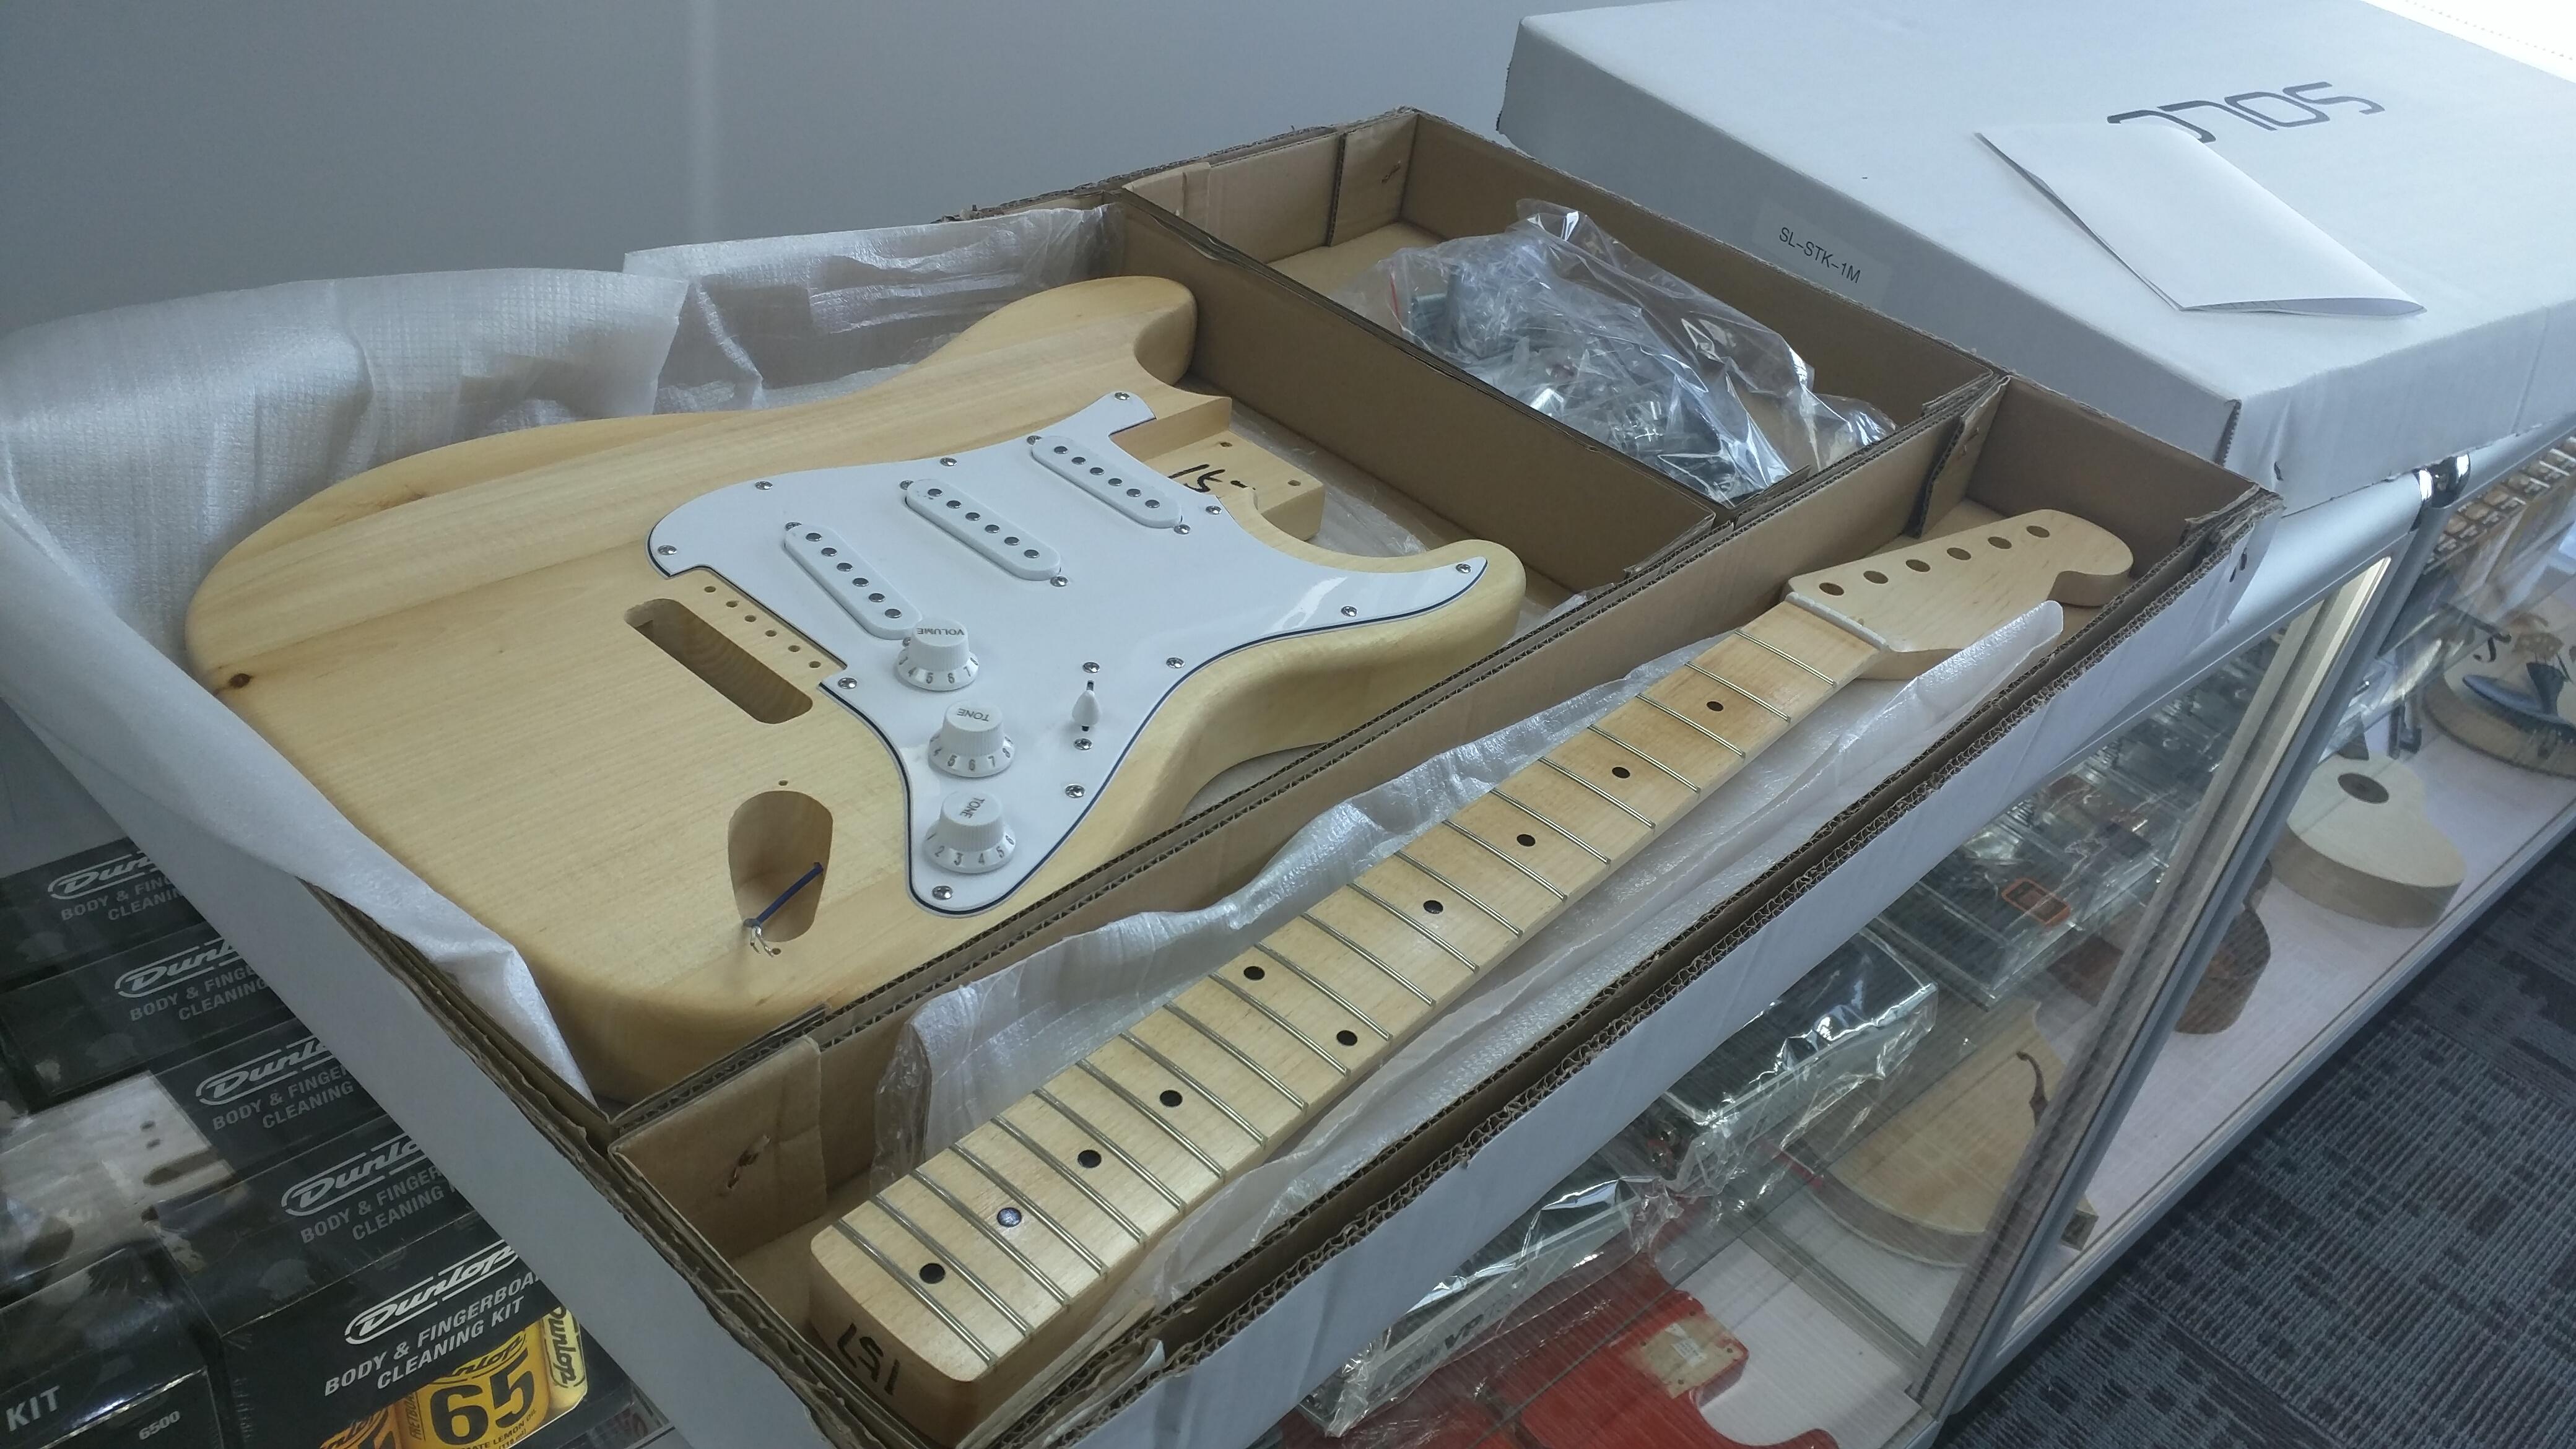 jonesy blue bertha my first partscaster electric guitar build brent jones. Black Bedroom Furniture Sets. Home Design Ideas